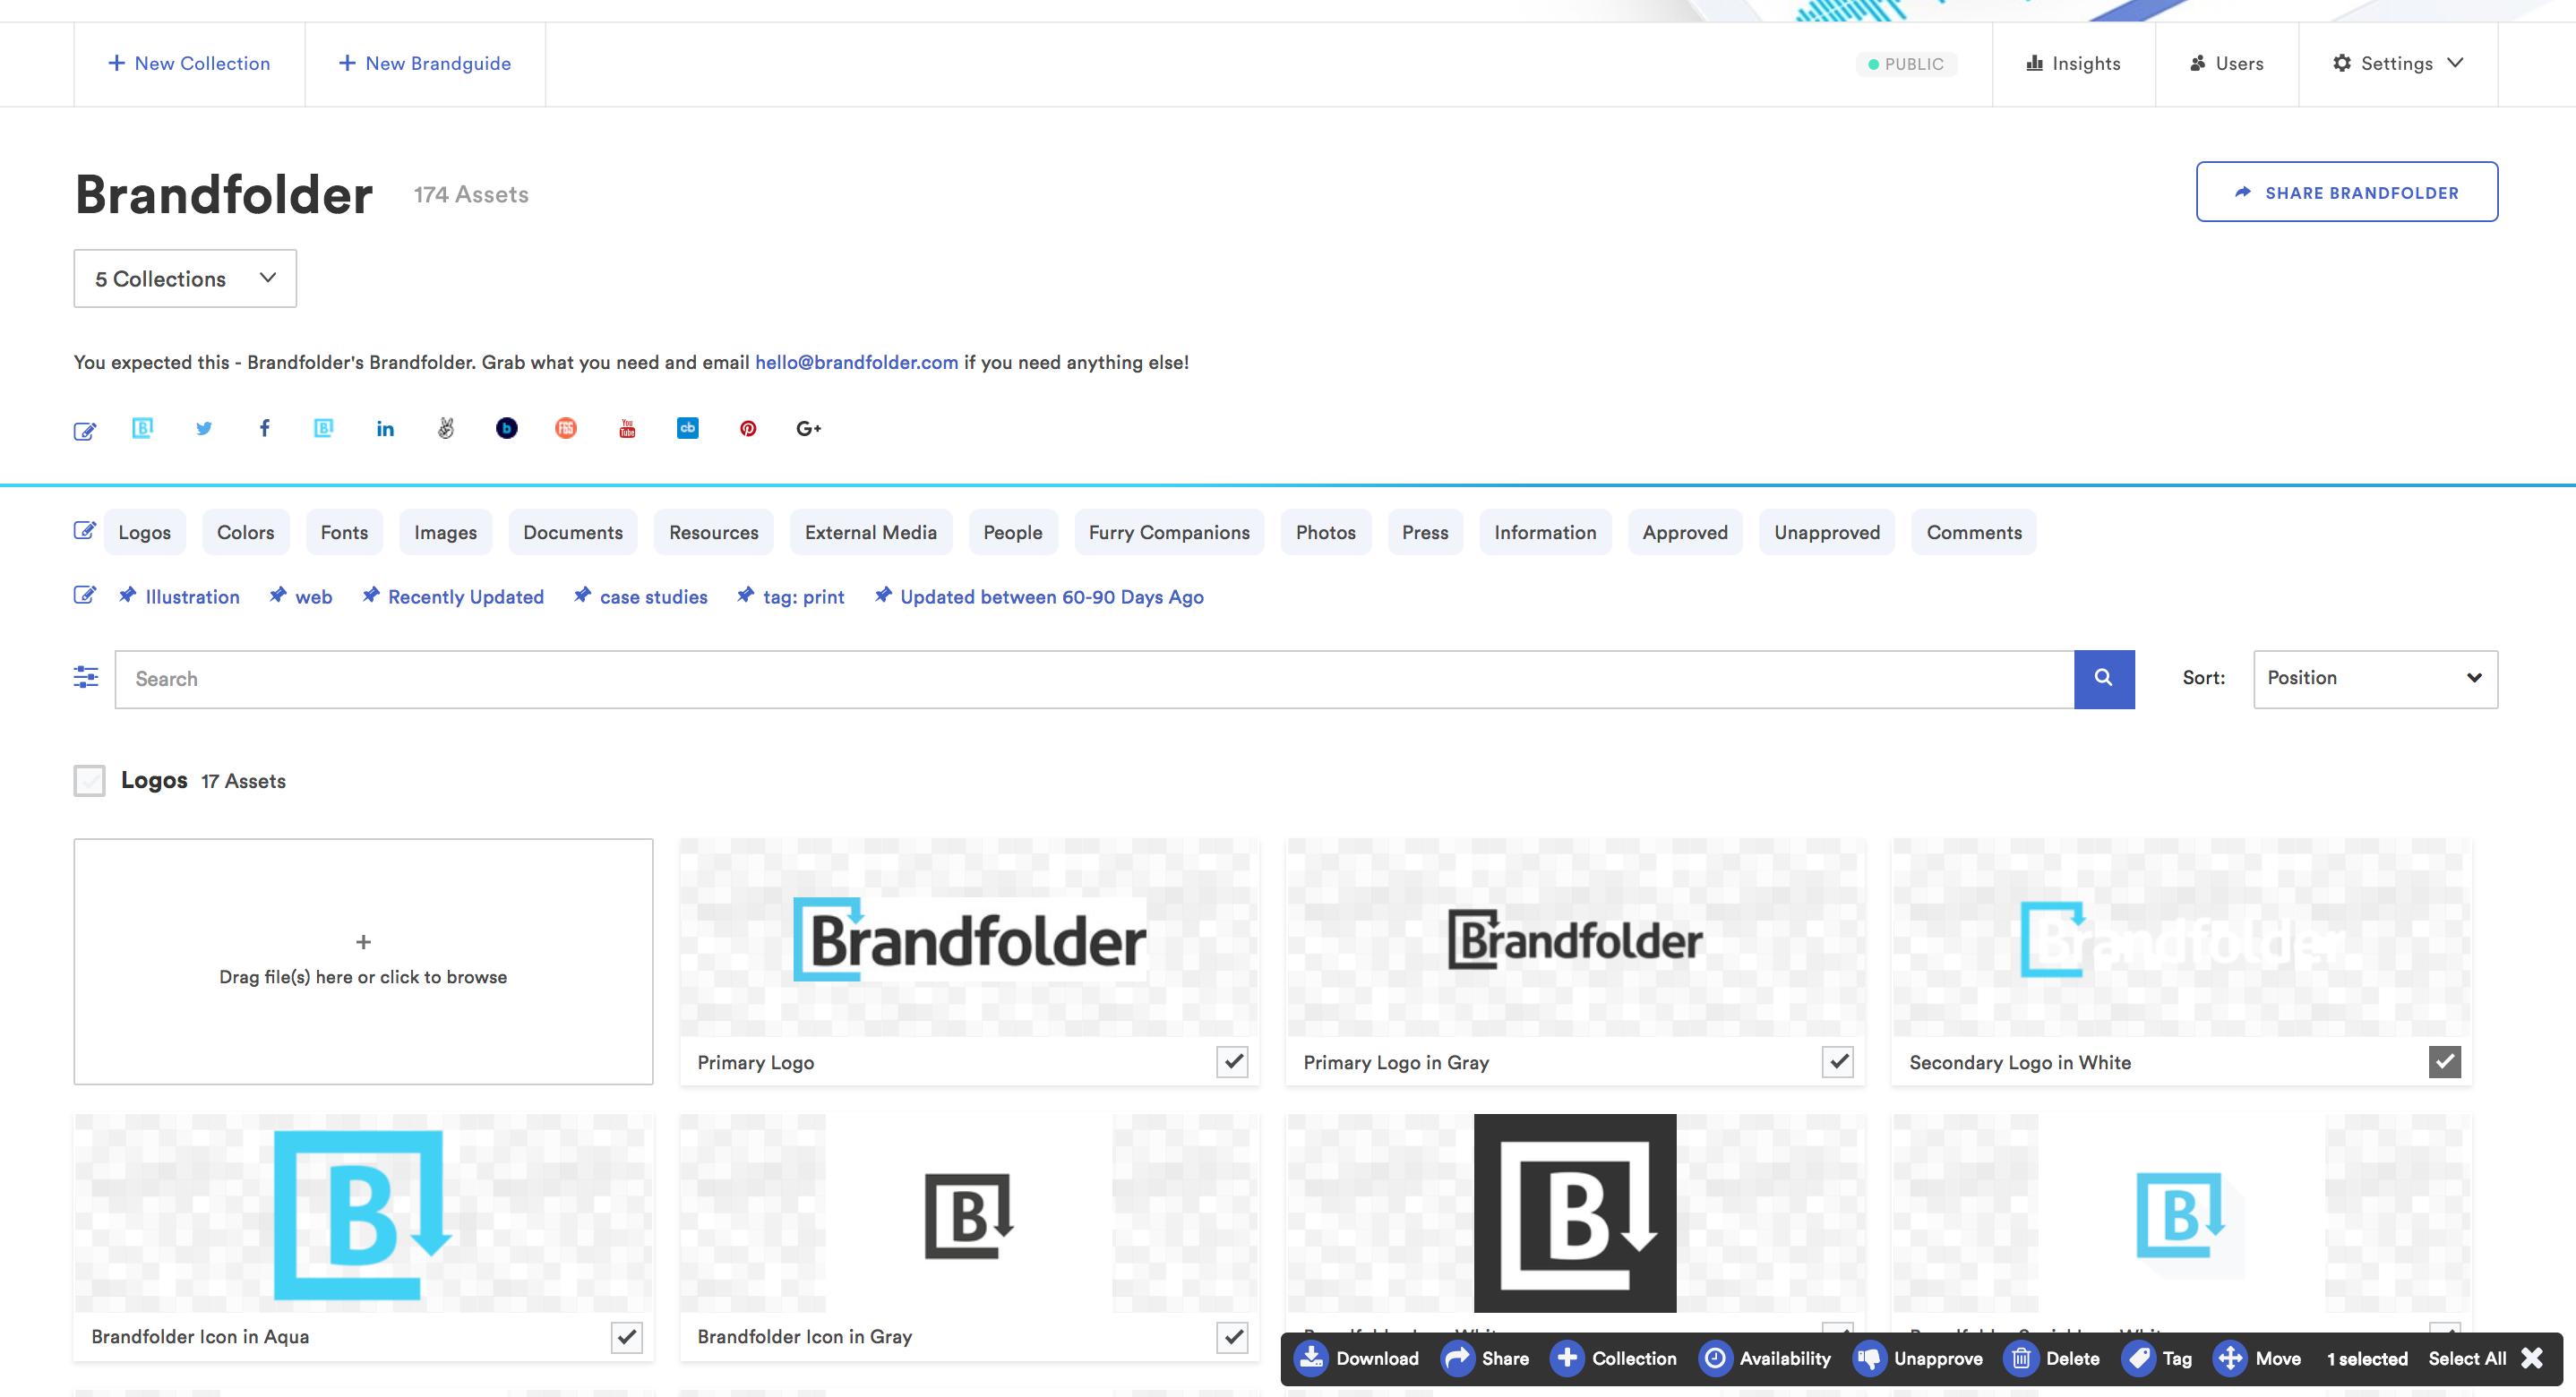 Brandfolder Software - Bulk actions